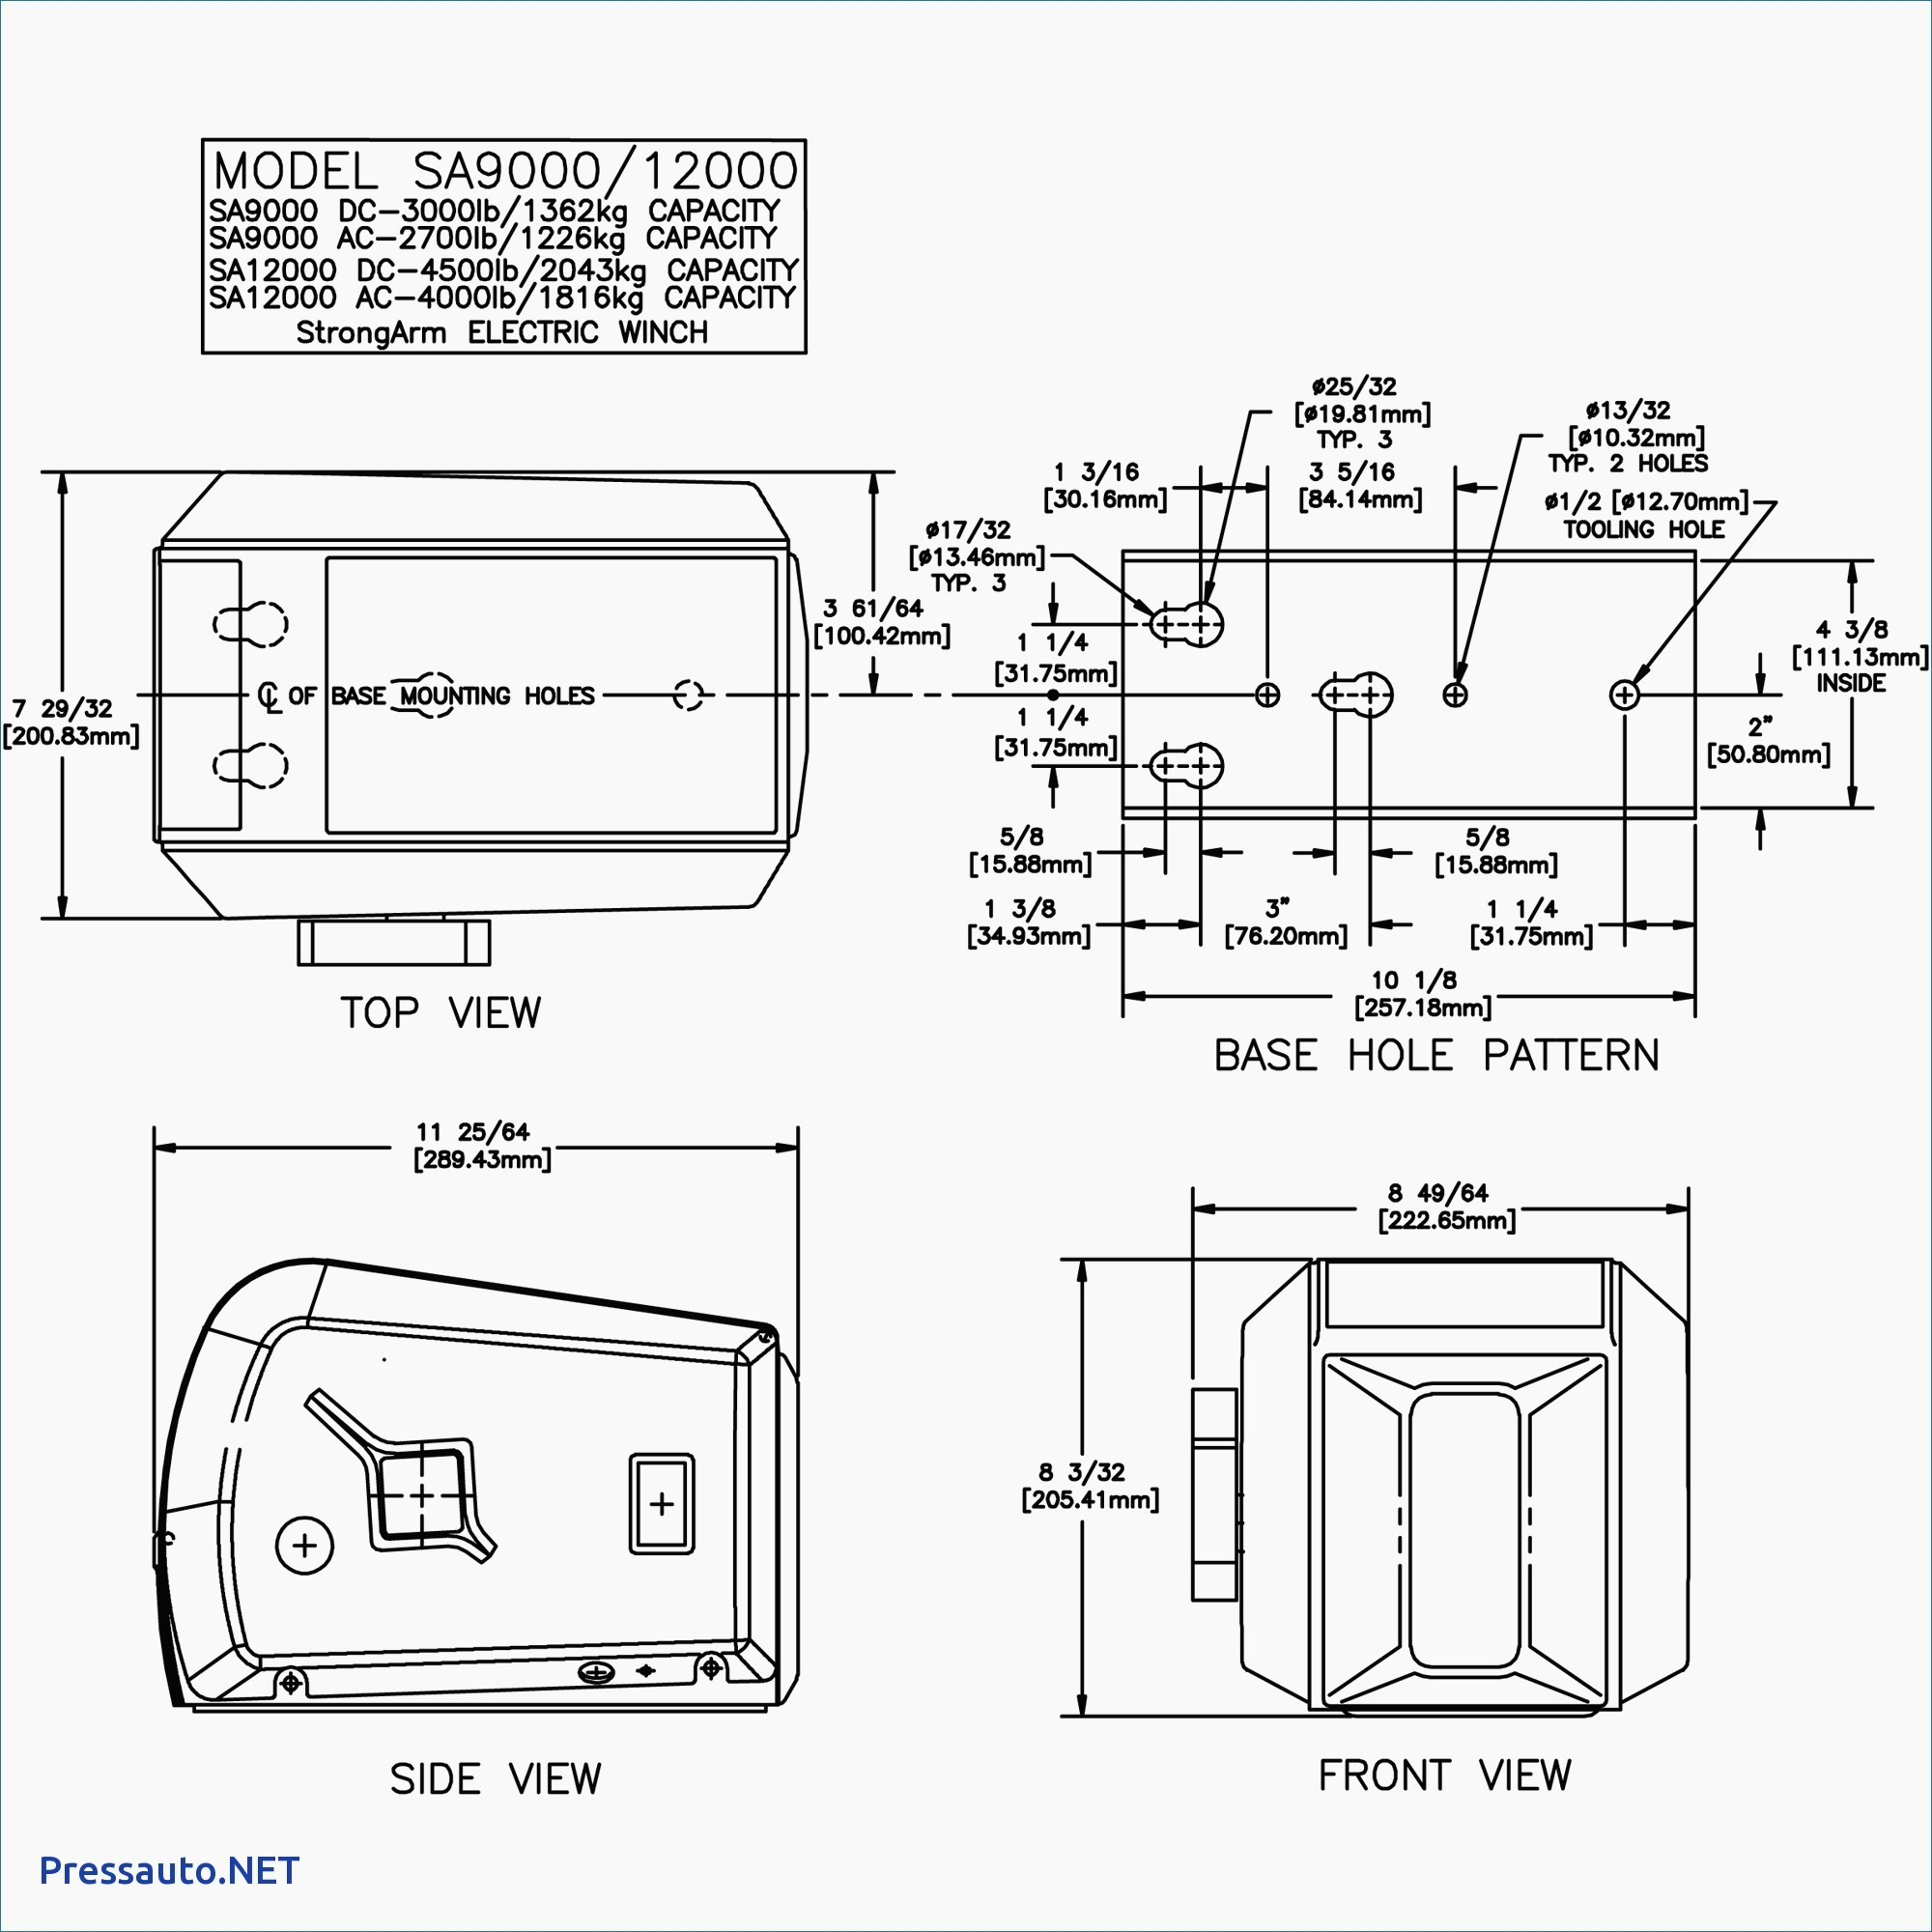 Ace Winch Wiring Diagram Trusted Diagrams 12 Volt Electric Grip Schematics U2022 Smittybuilt